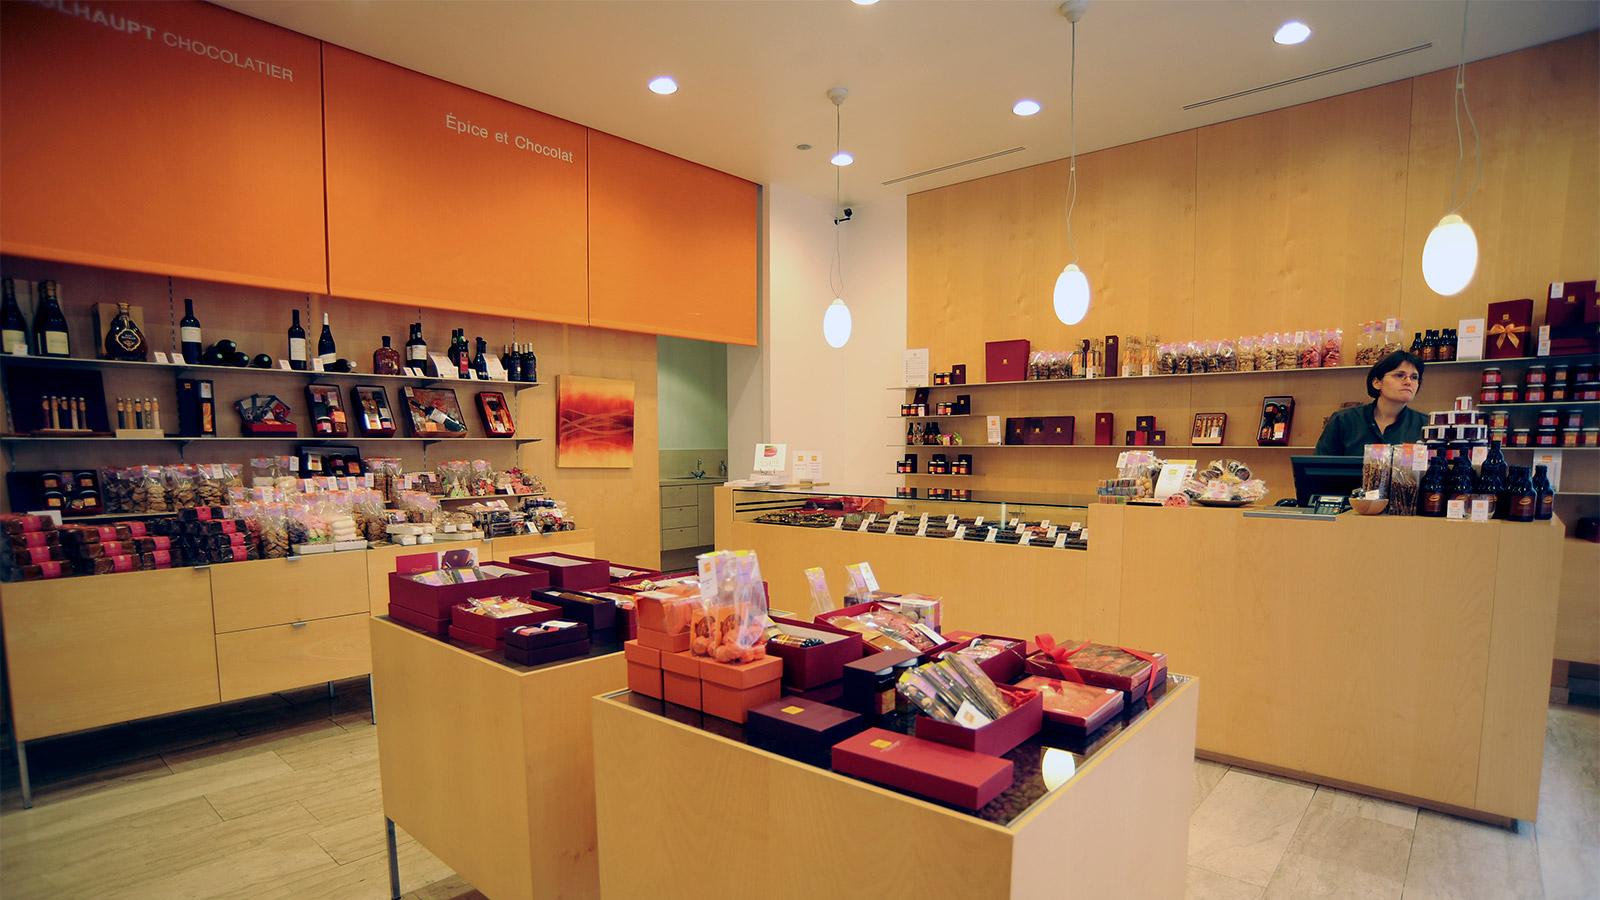 boutique temple neuf strasbourg par thierry mulhaupt chocolats gourmandises. Black Bedroom Furniture Sets. Home Design Ideas